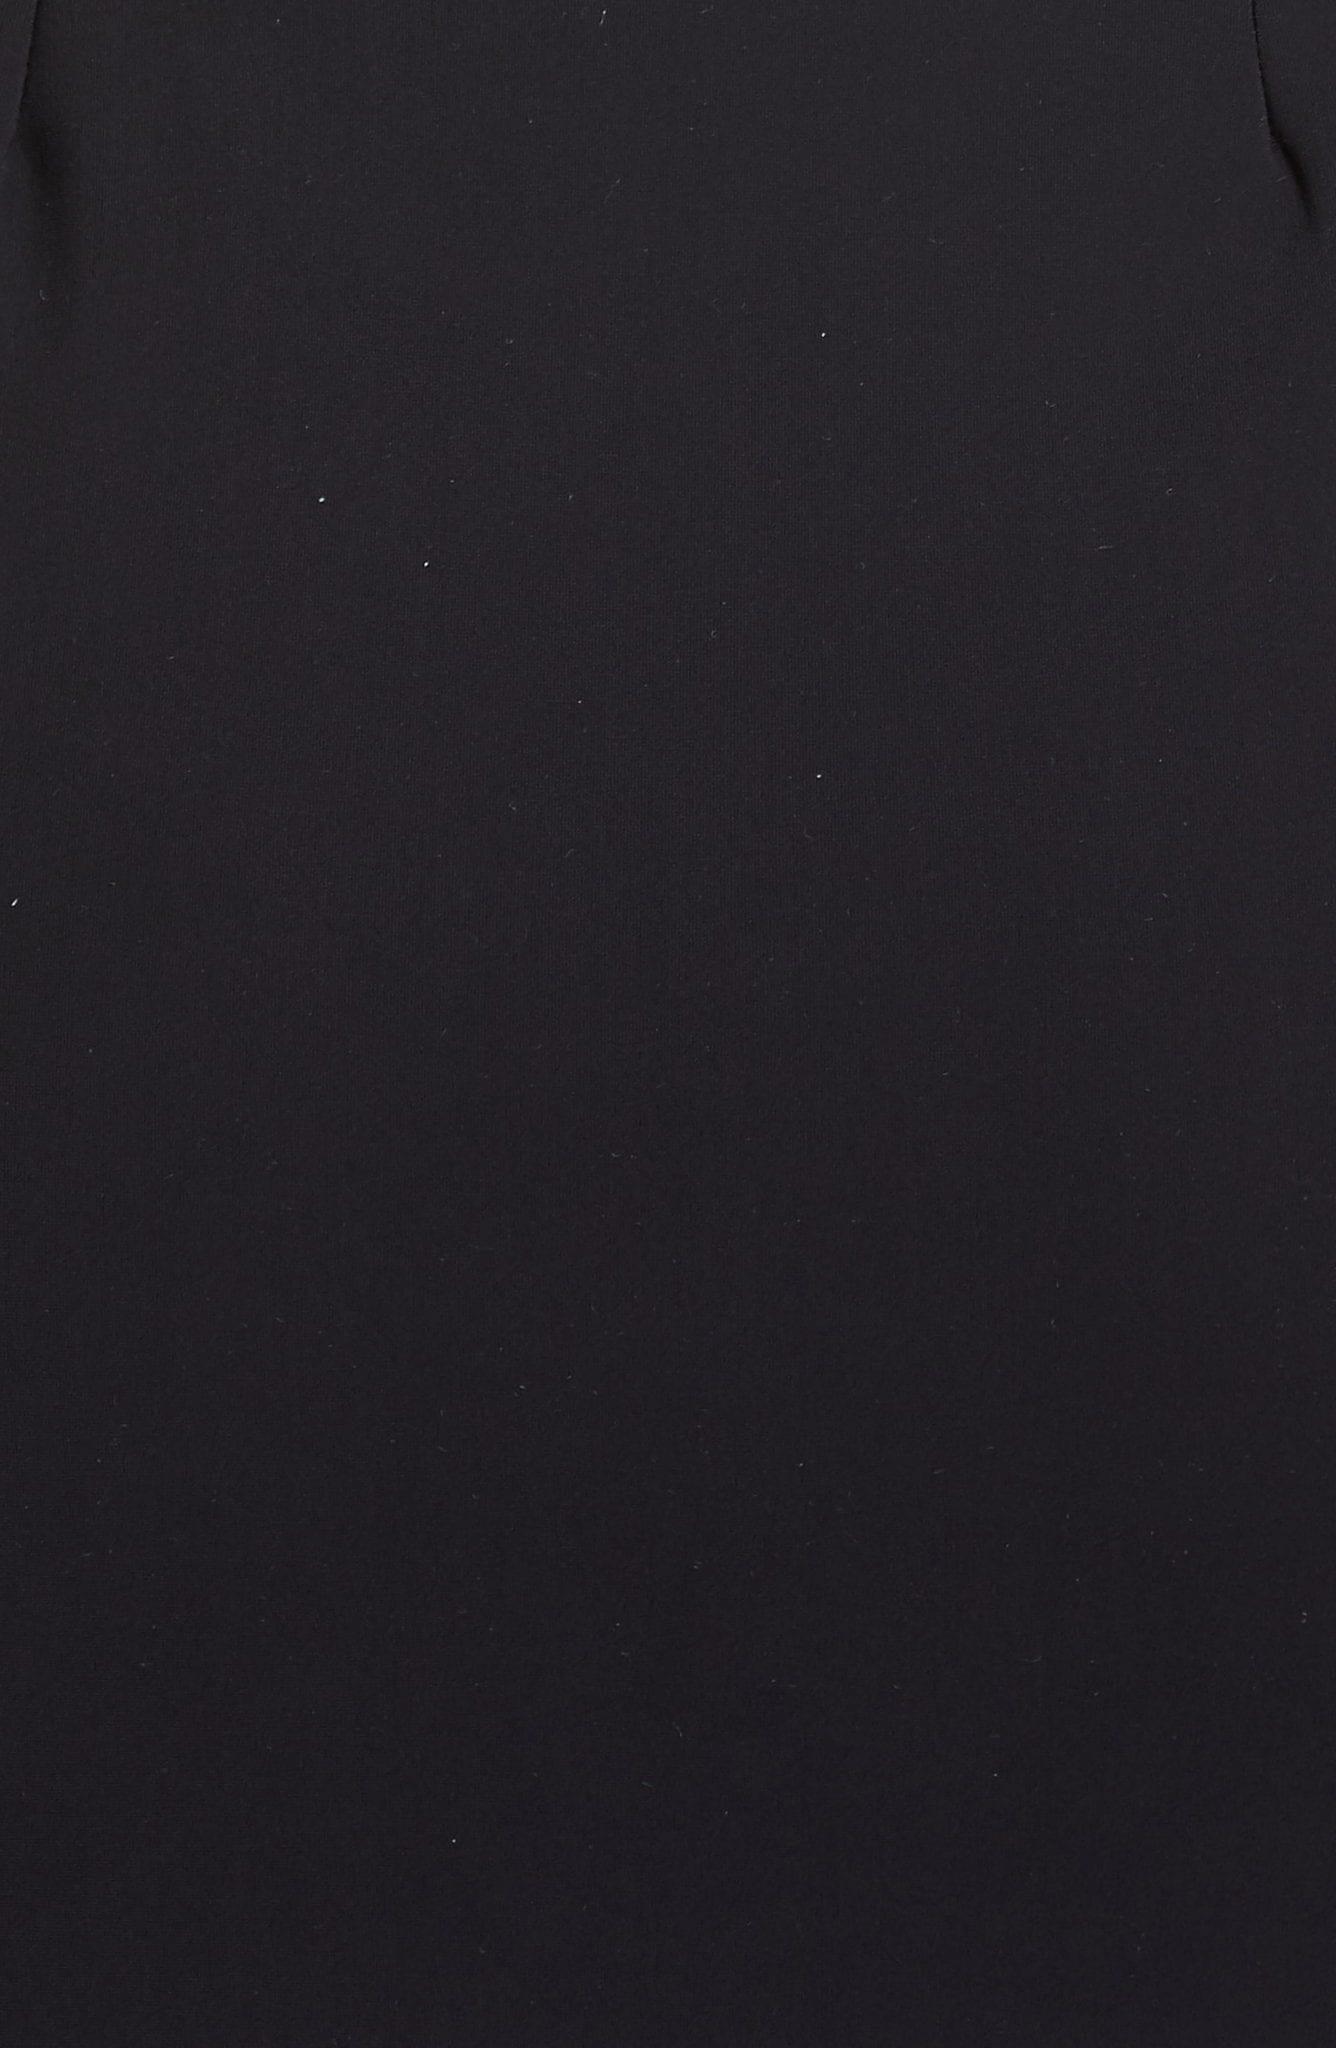 CHIARA BONI LA PETITE ROBE Florien Ruched Evening Black Dress